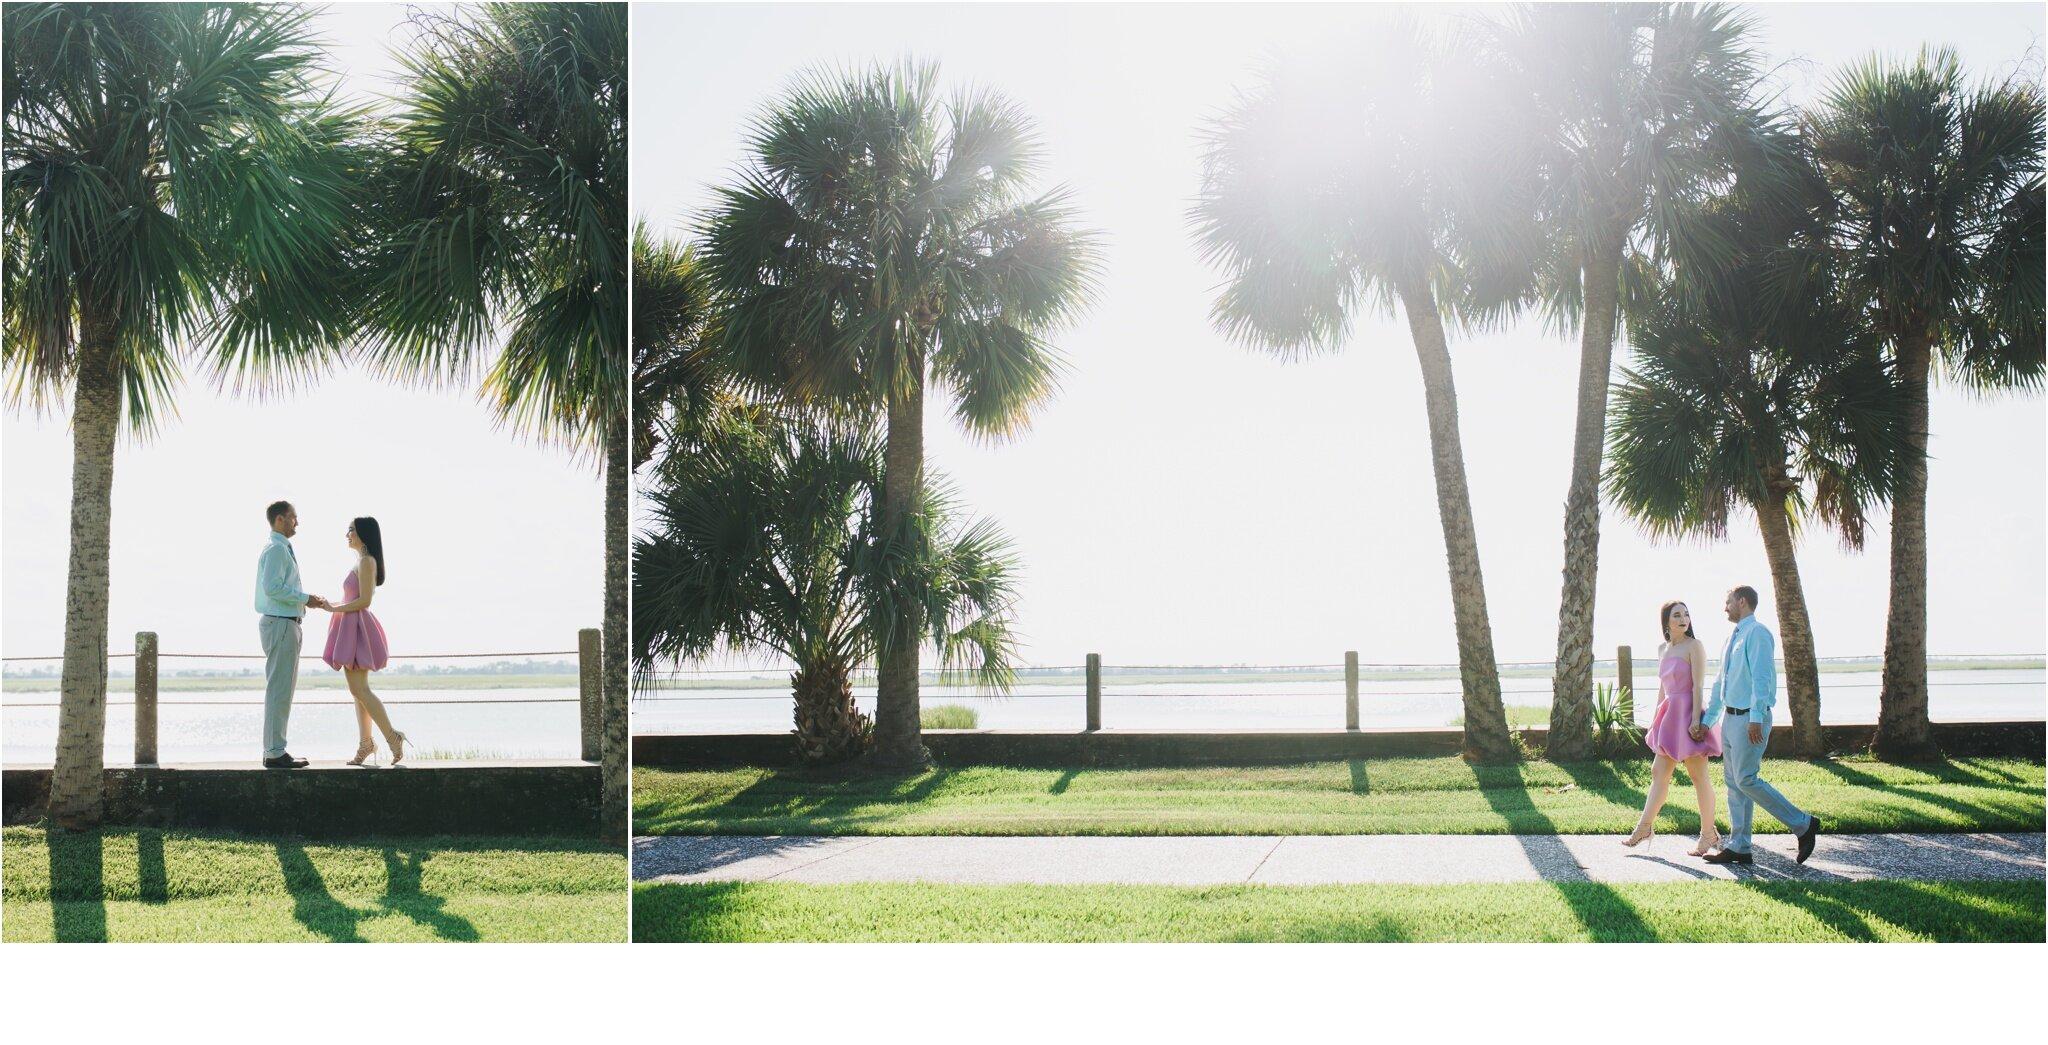 Rainey_Gregg_Photography_St._Simons_Island_Georgia_California_Wedding_Portrait_Photography_1827.jpg